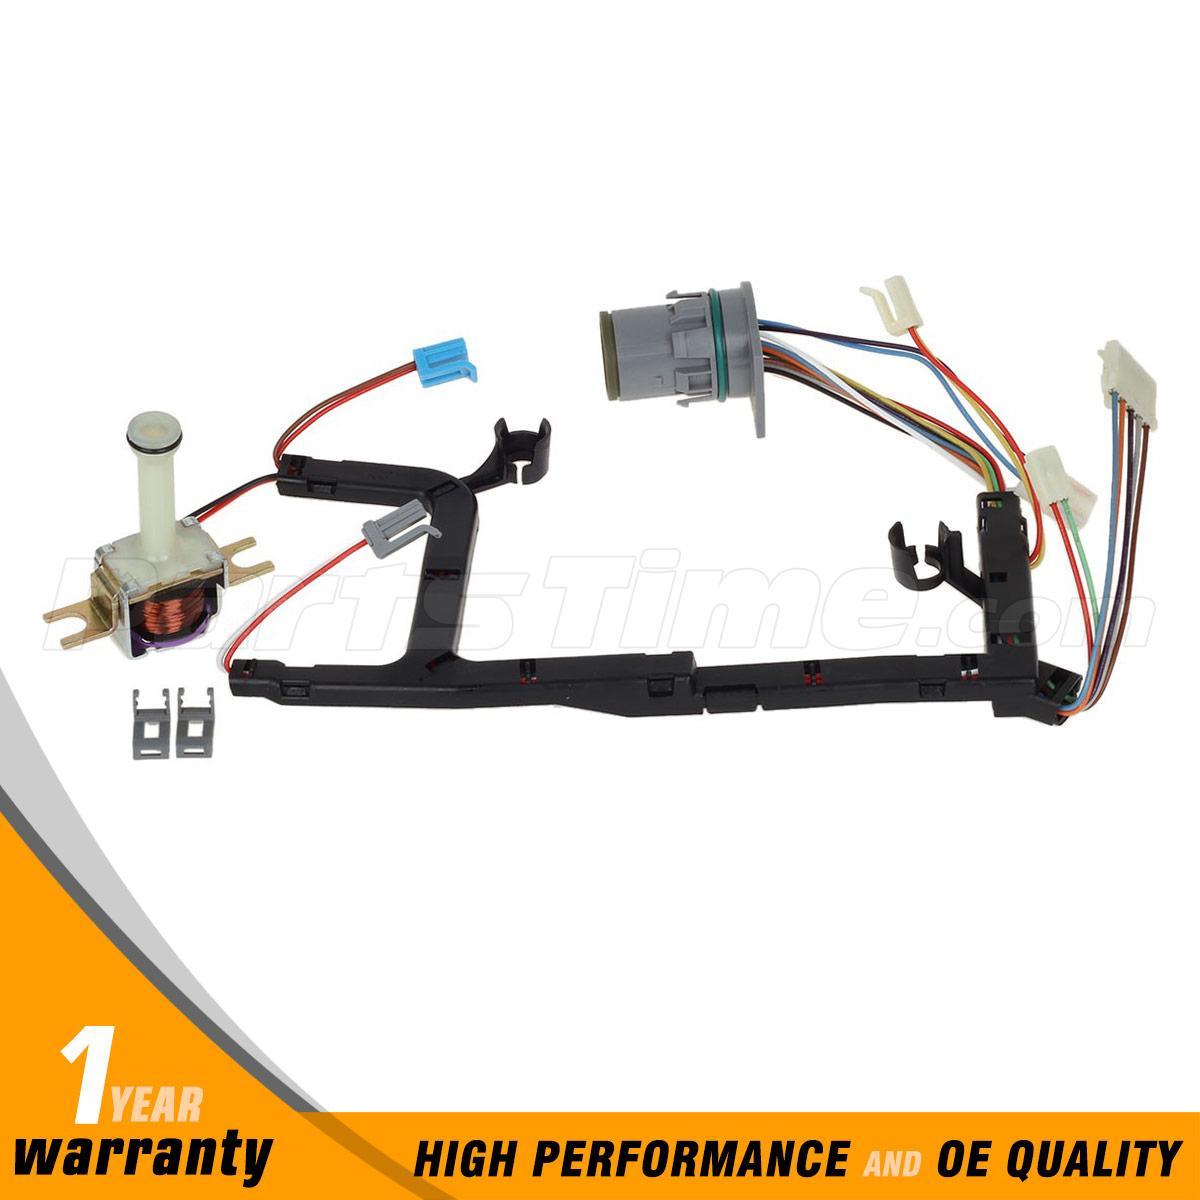 142072 7?p=ZGVhbGNsaWNr&s=t&rn=5457230 transmission 4l60e tcc look up solenoid with internal wire harness 4l60e transmission internal wiring harness at mifinder.co